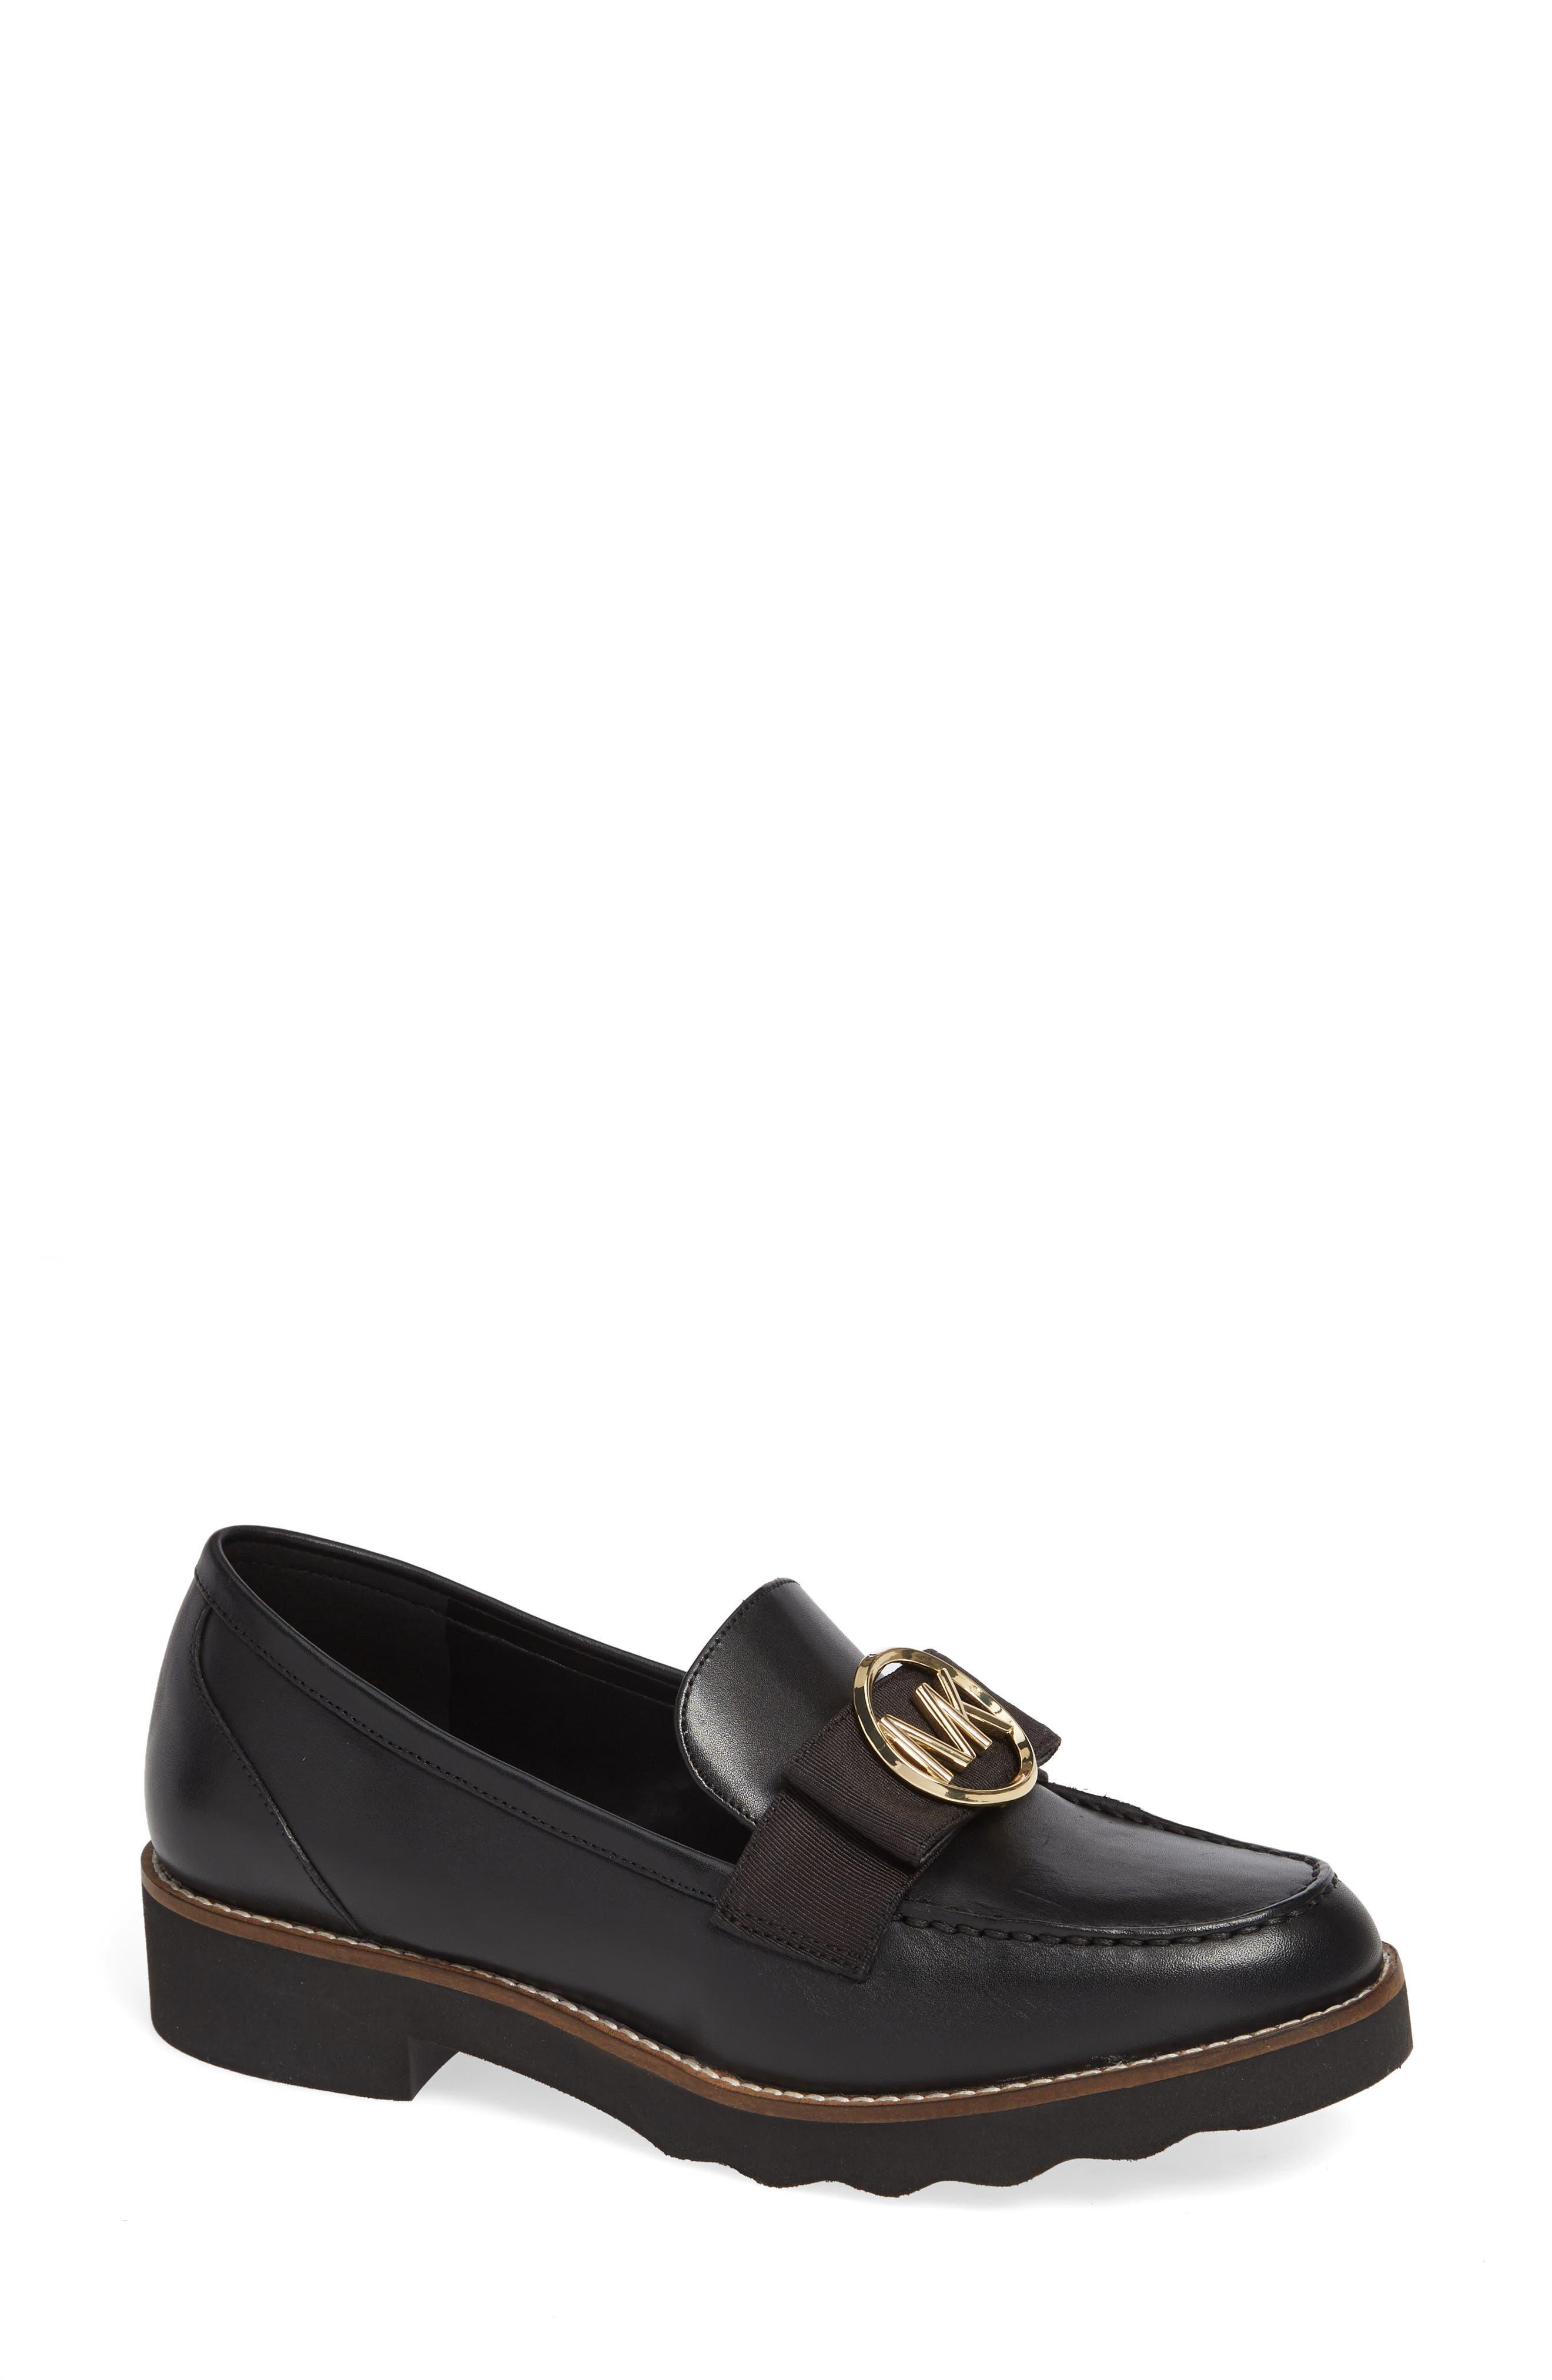 Aden Loafer in Black Vachetta Leather